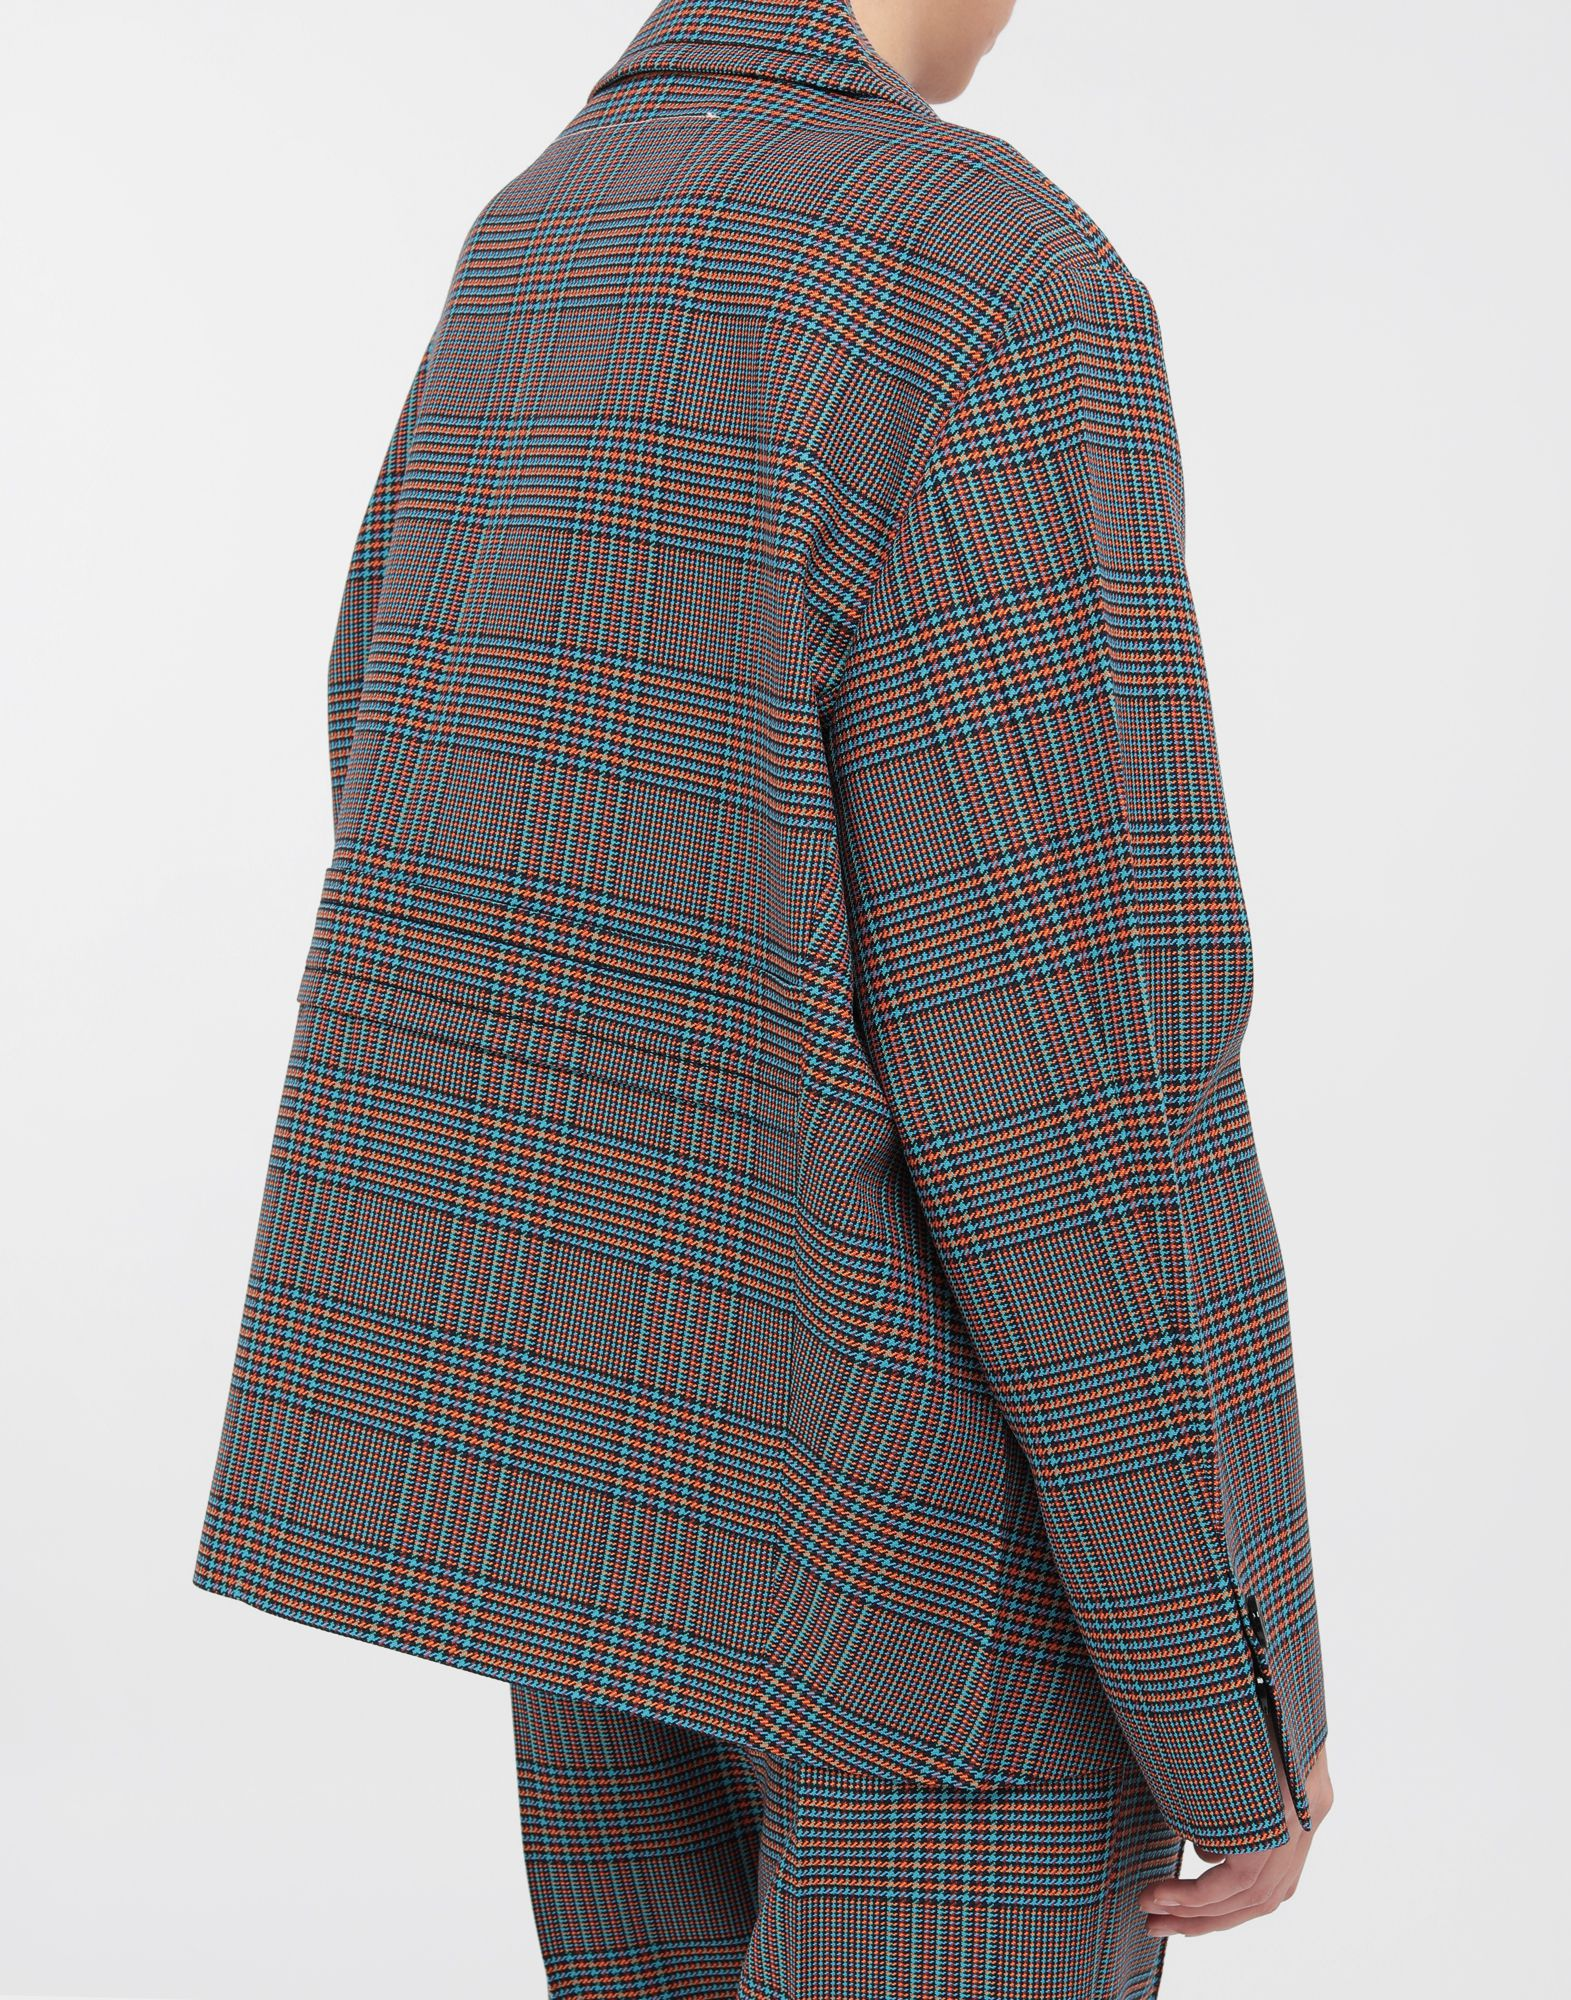 MM6 MAISON MARGIELA Oversized checked wool jacket Blazer Woman b